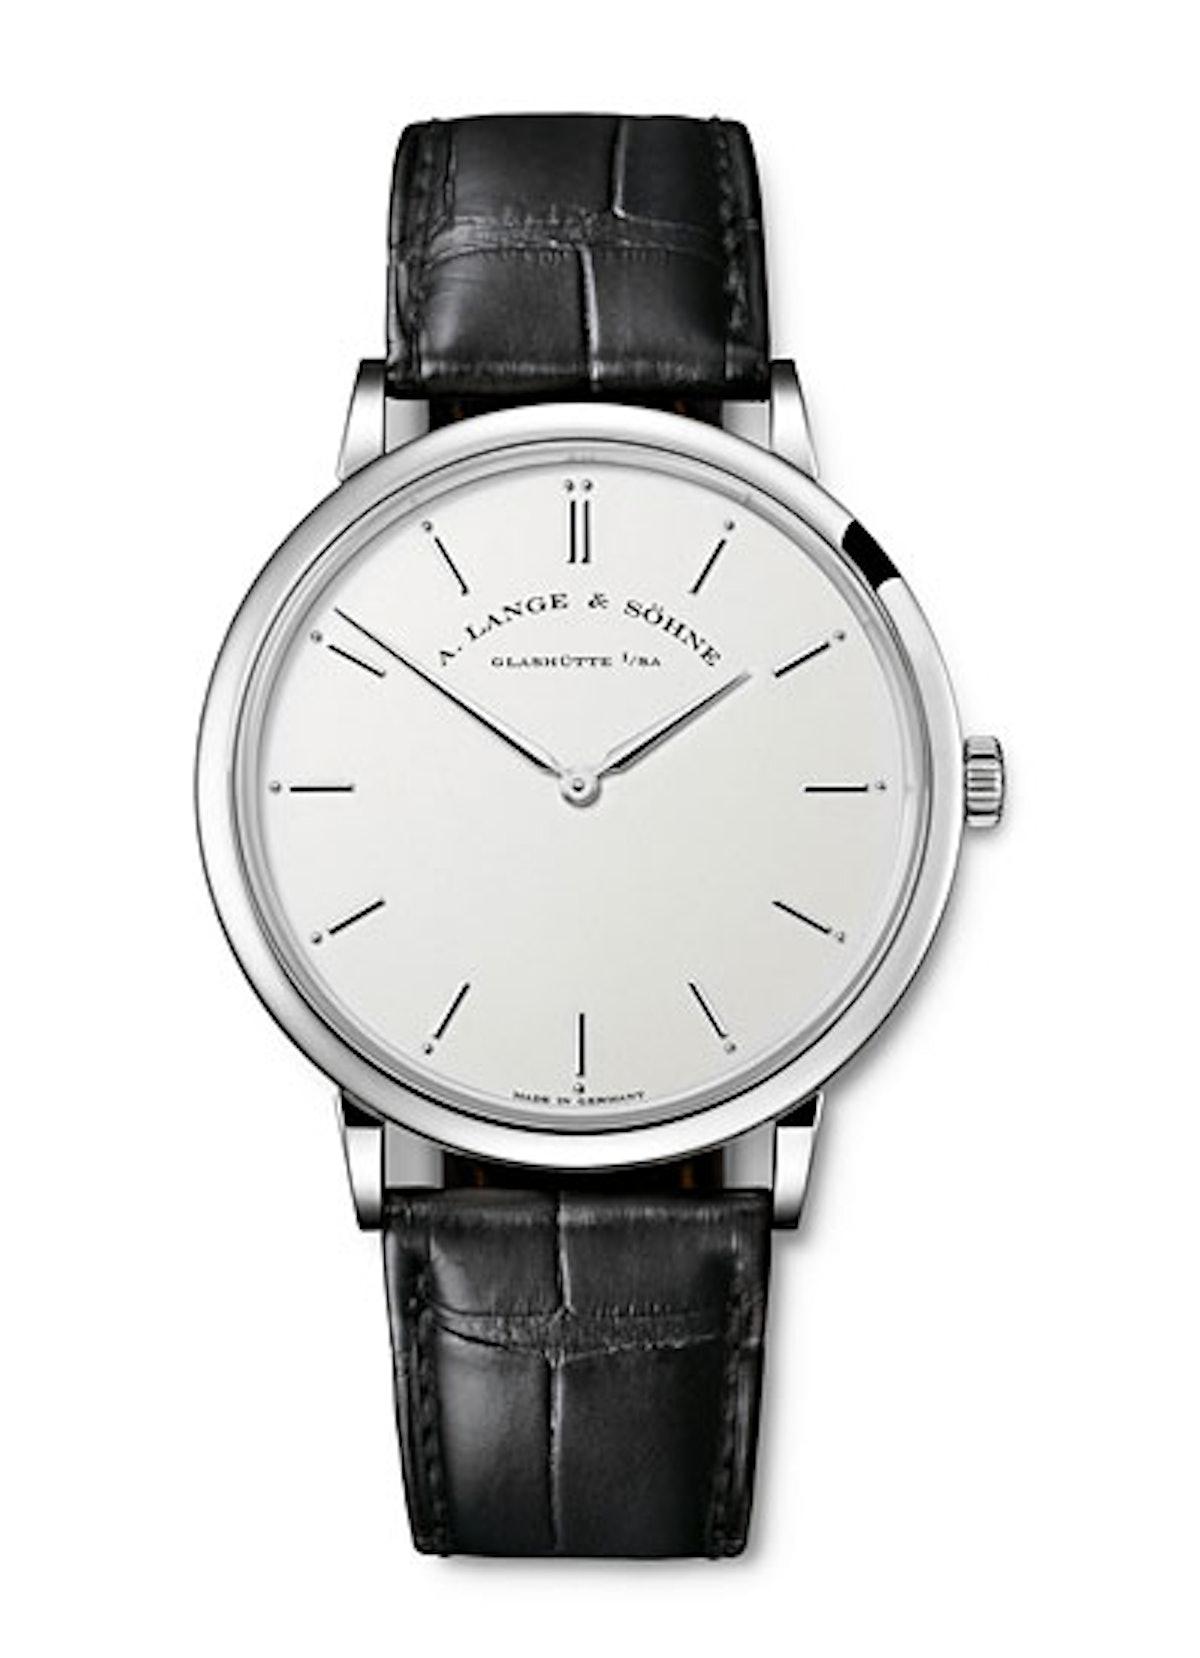 acss-geneva-watches-08-v.jpg